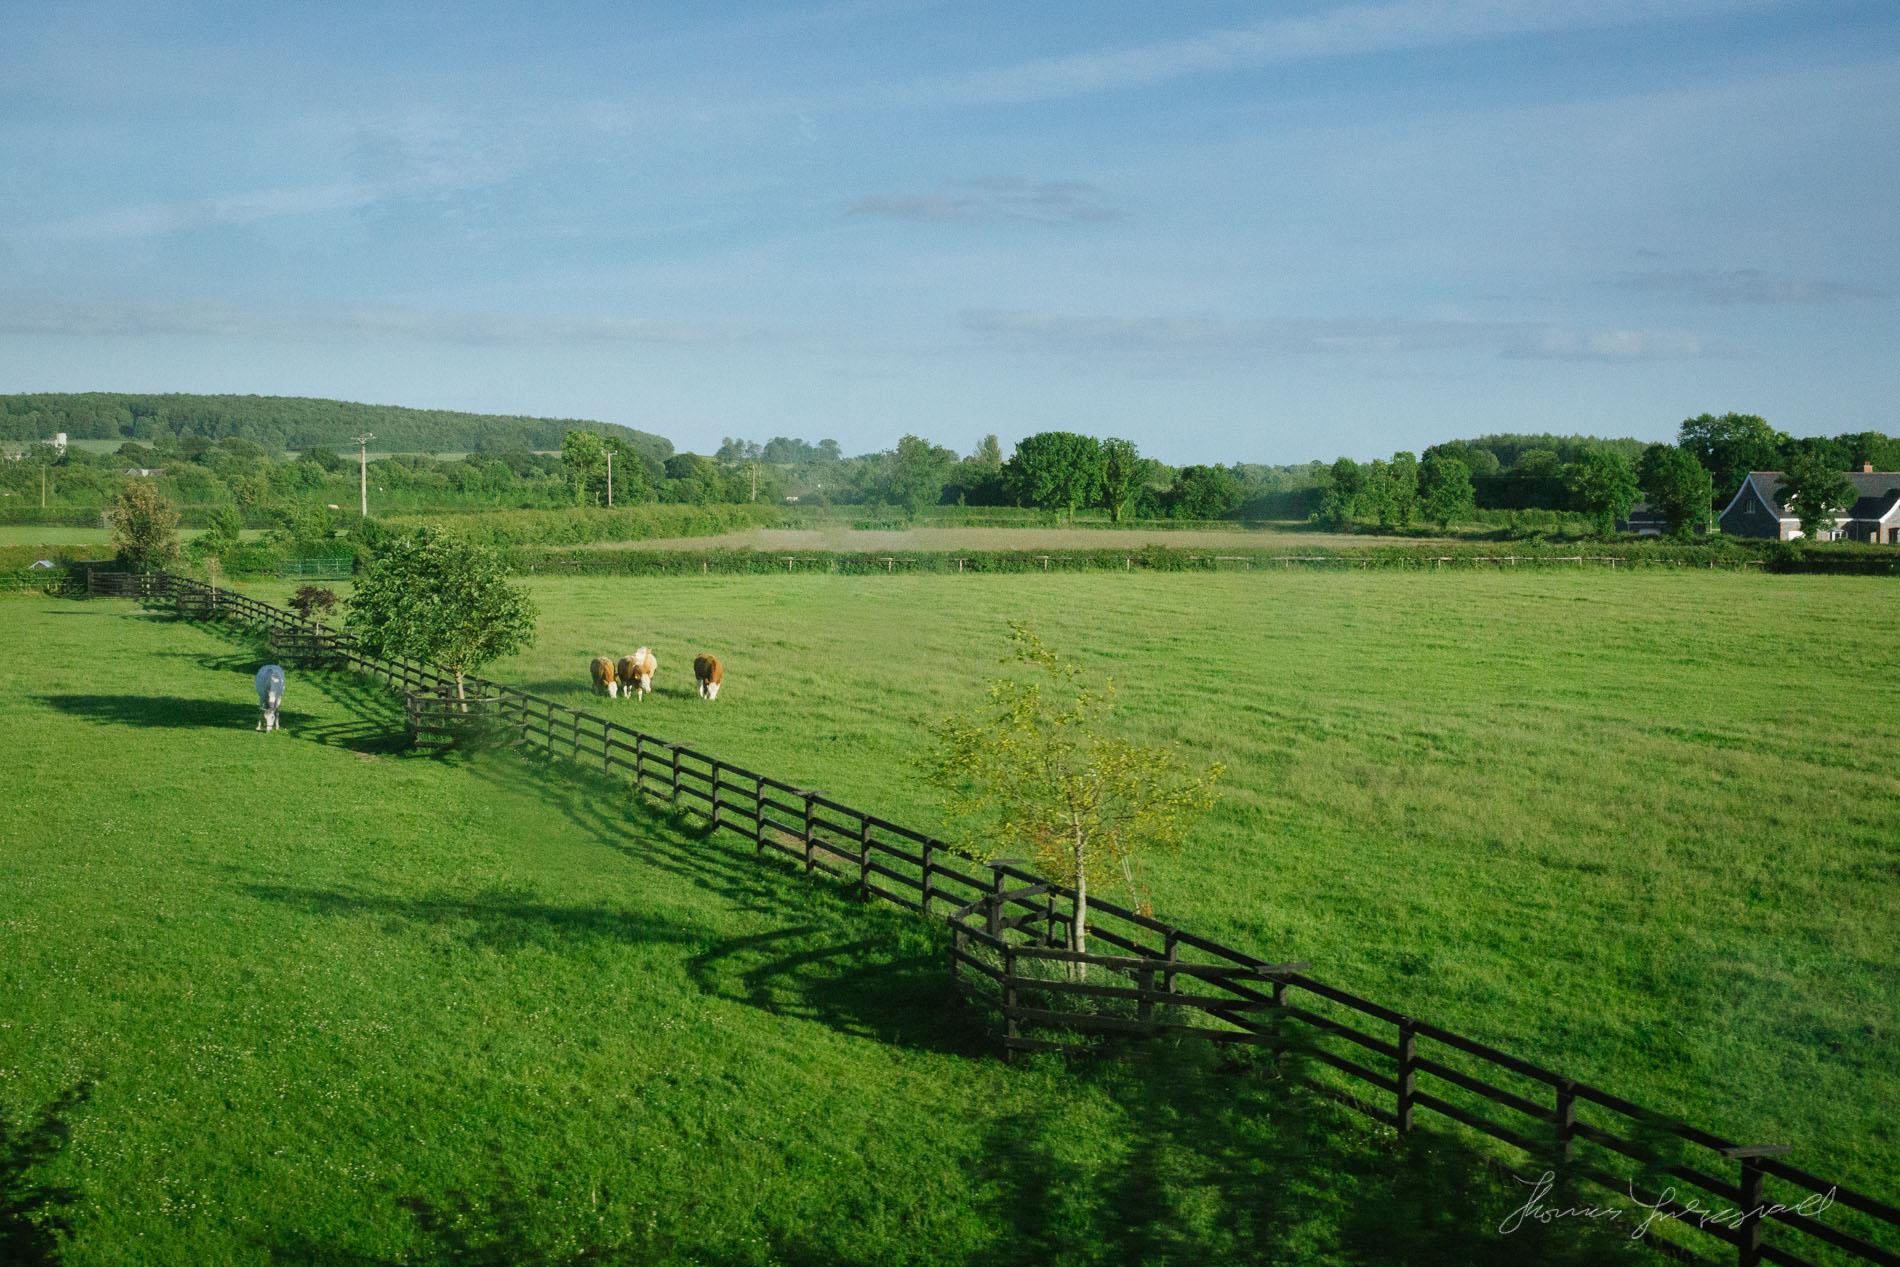 A Farm as Seen from the Train